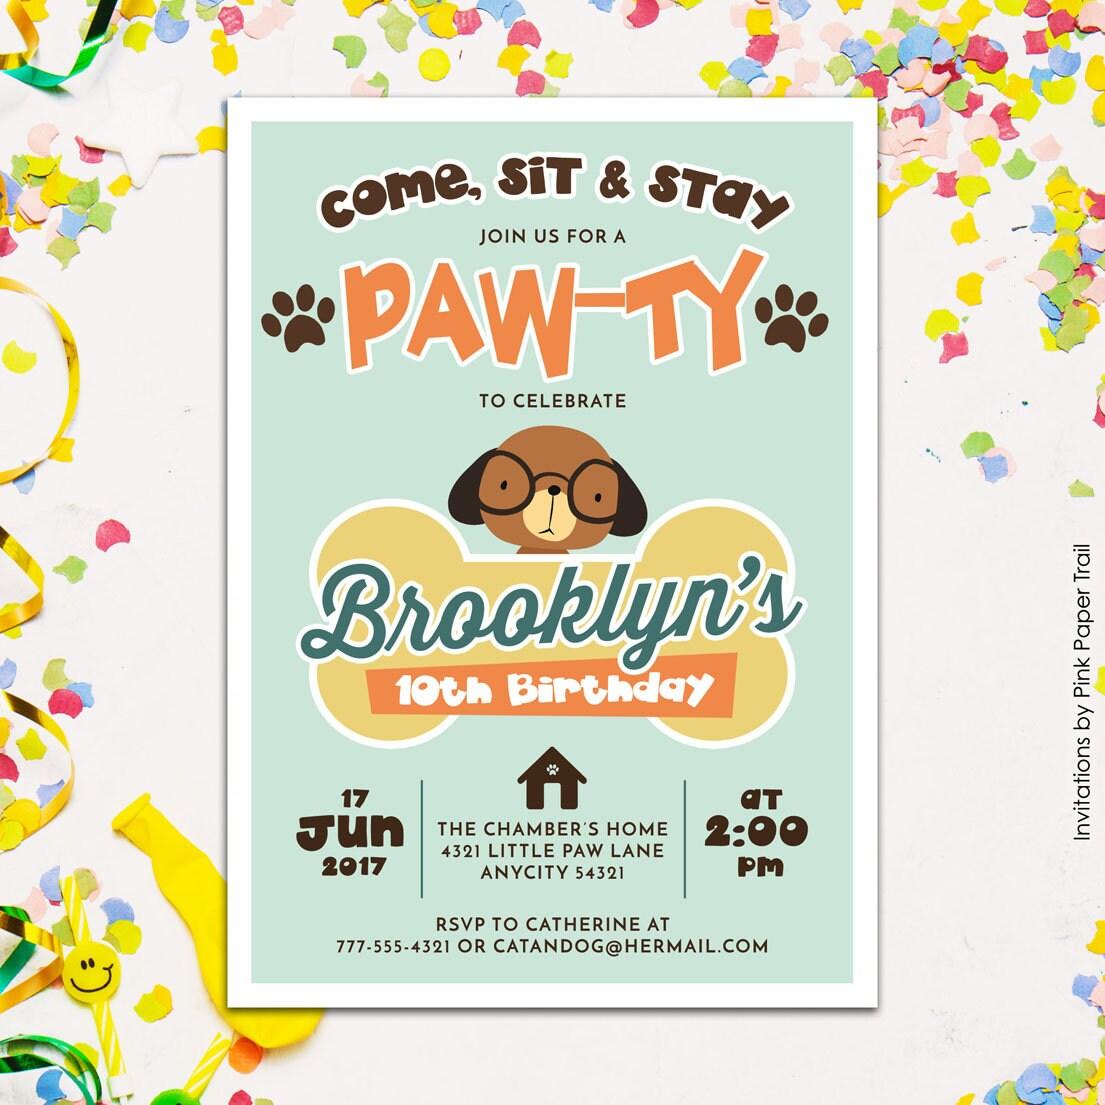 Cute Puppy Dog Birthday Party Invitation Puppy Paw-Ty